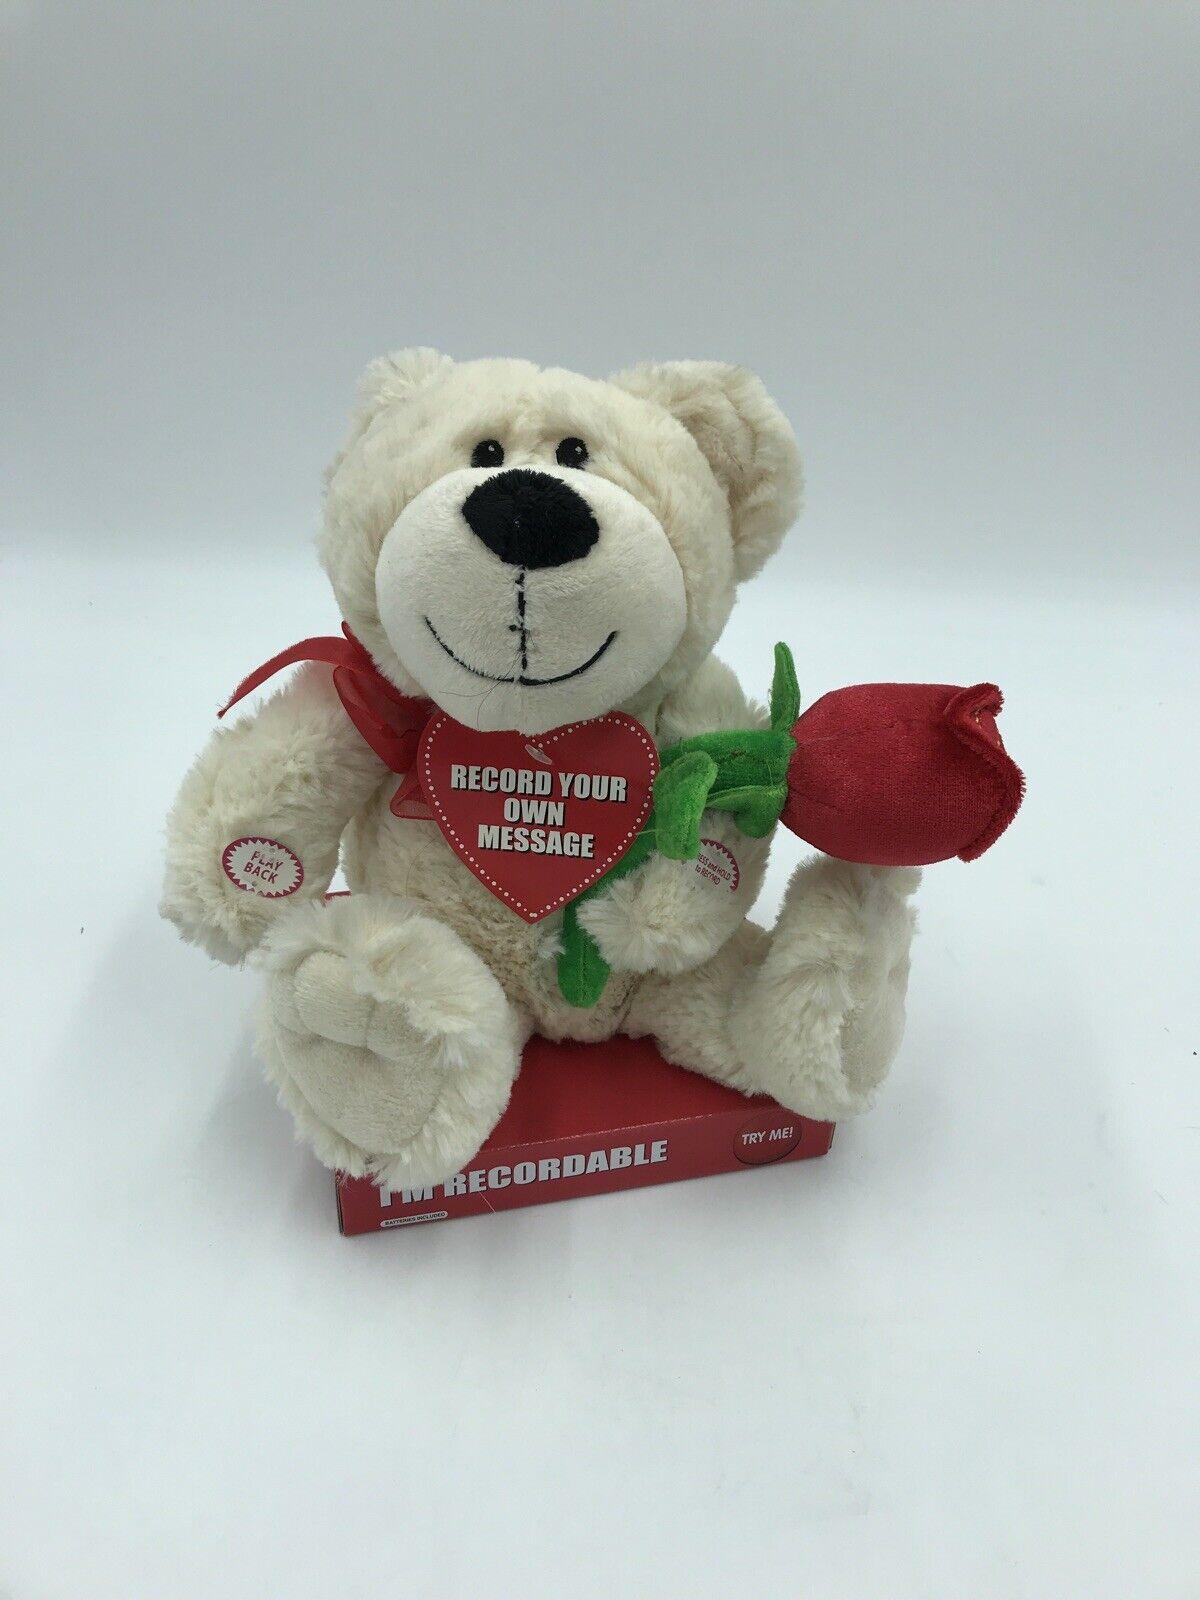 Recordable Teddy Bear Walmart, Dan Dee Singing Dog Jesus Loves Me Stuffed Cream Plush Soft Toy Light Up Star 8 For Sale Online Ebay